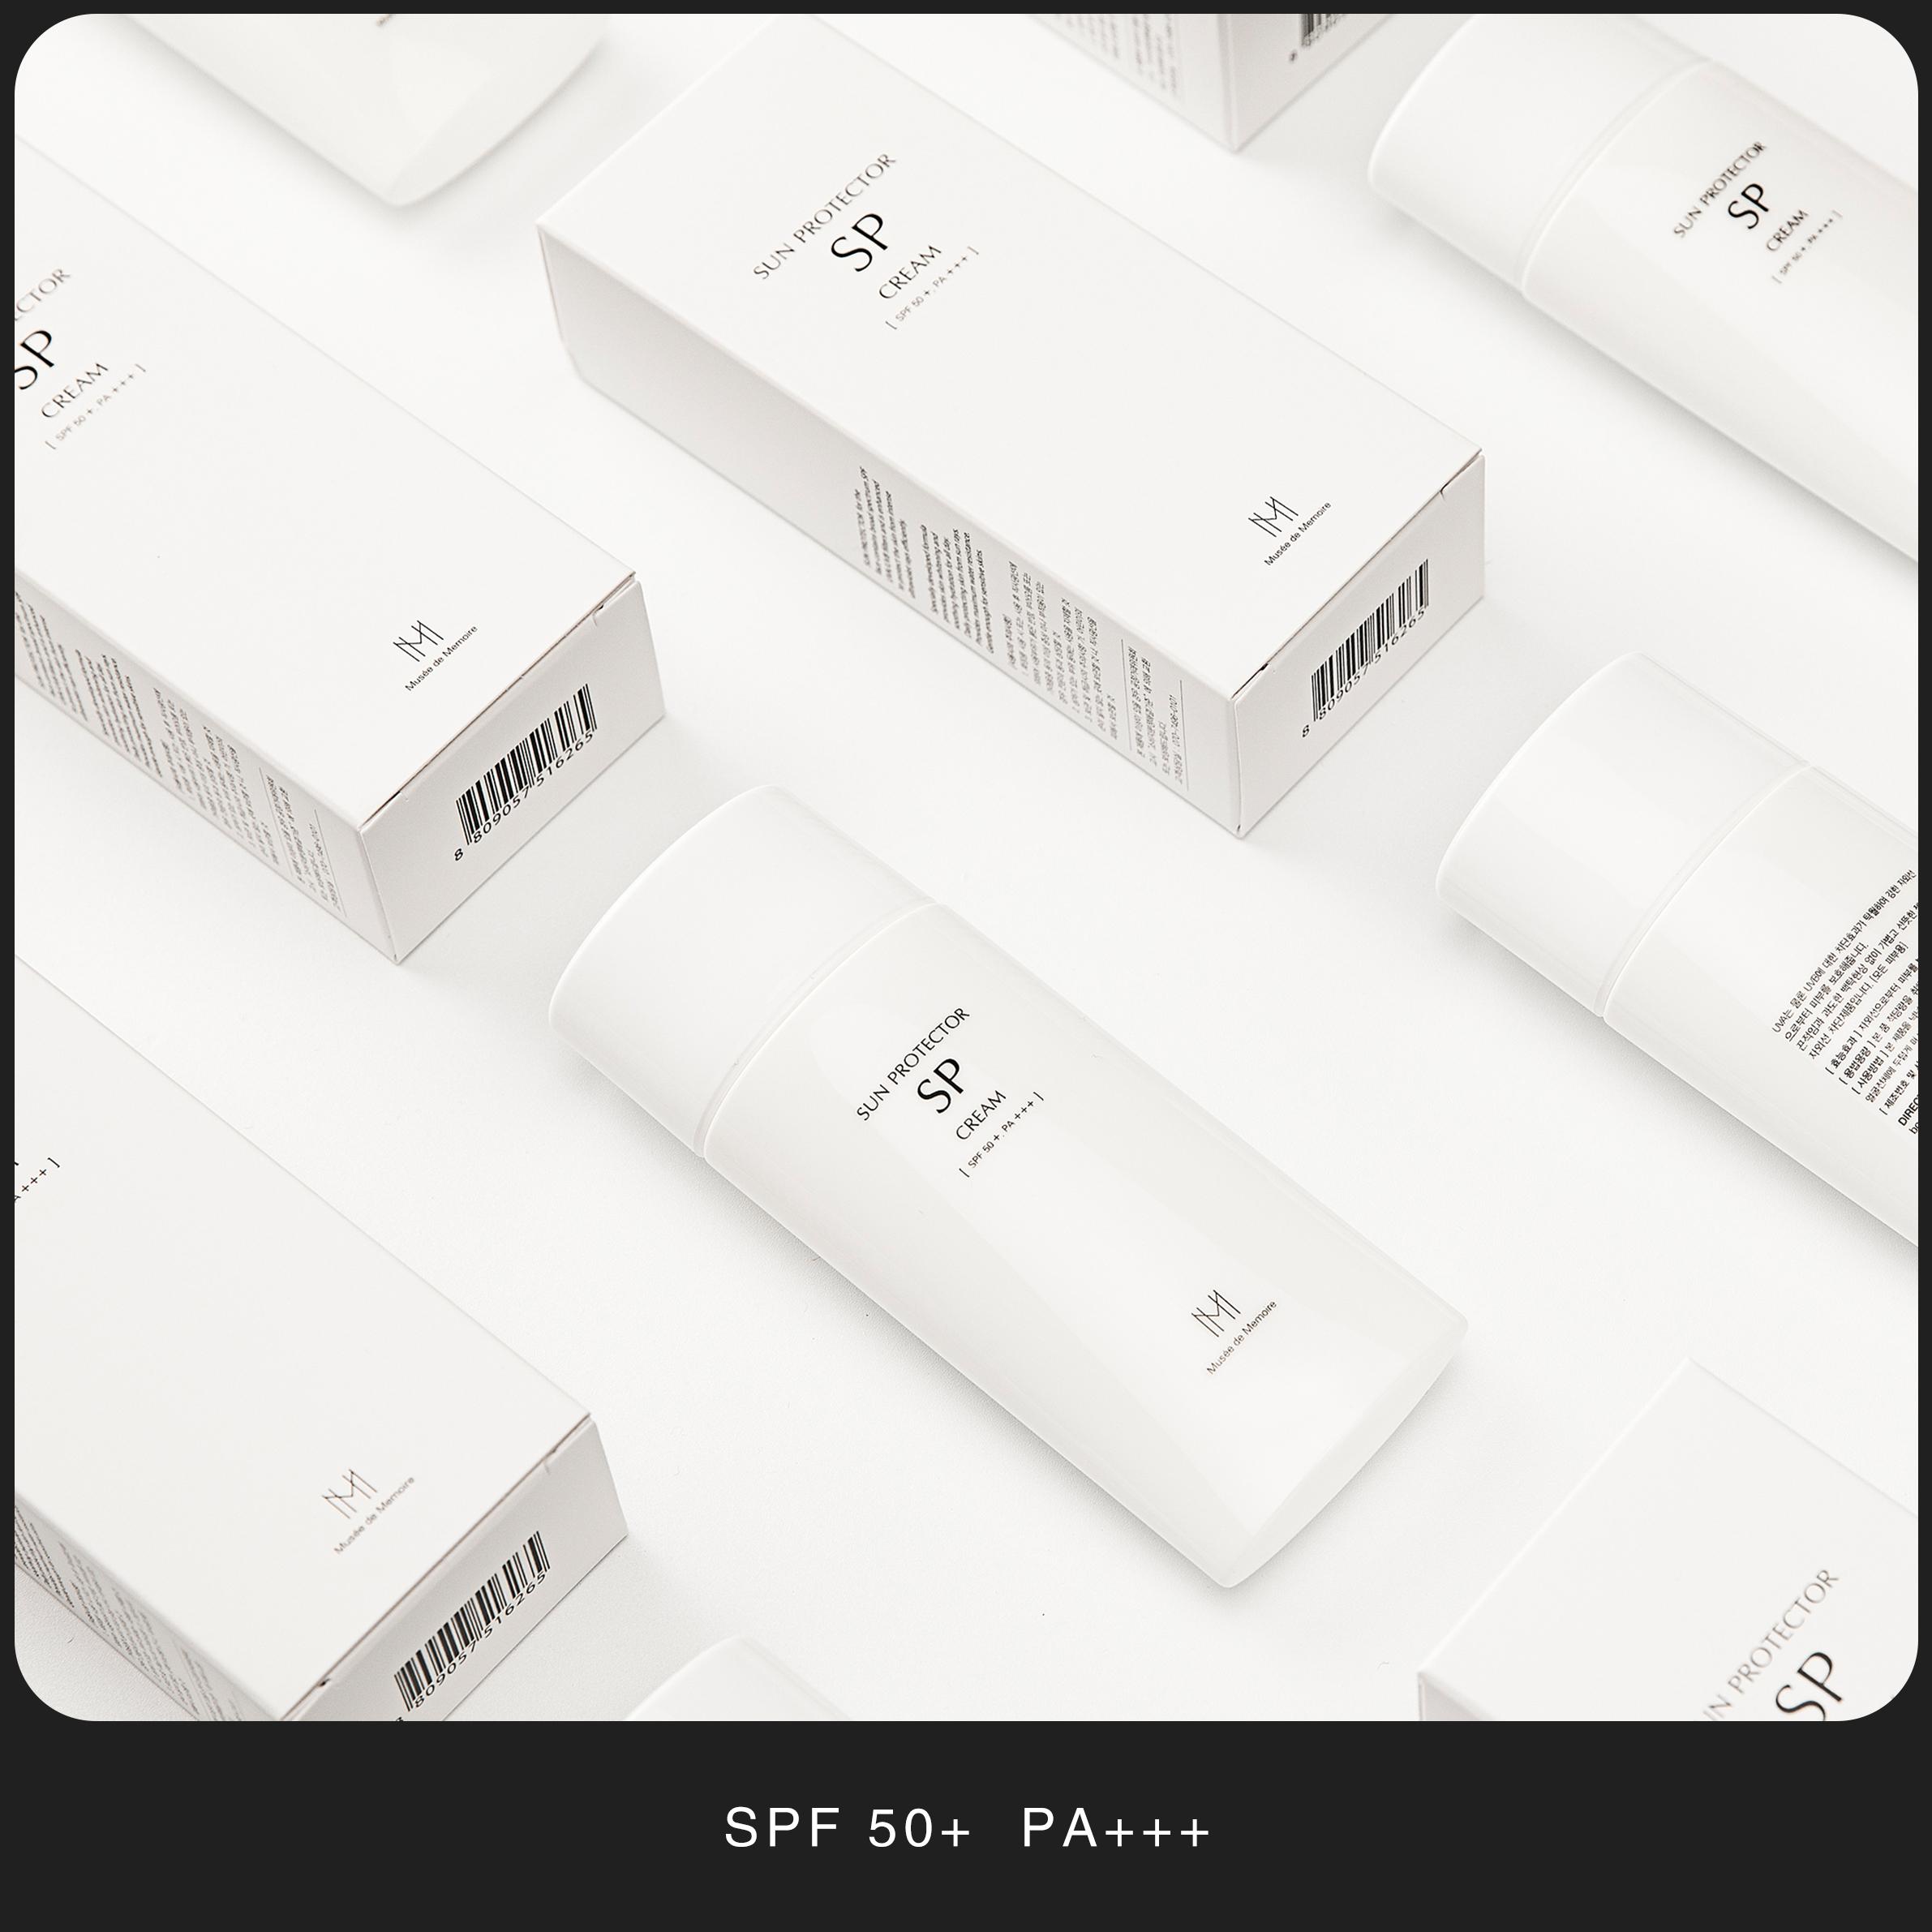 MDMO韩国清爽不油腻防晒霜UVA UVB  SPF50+ PA+++ 新批次开始发货